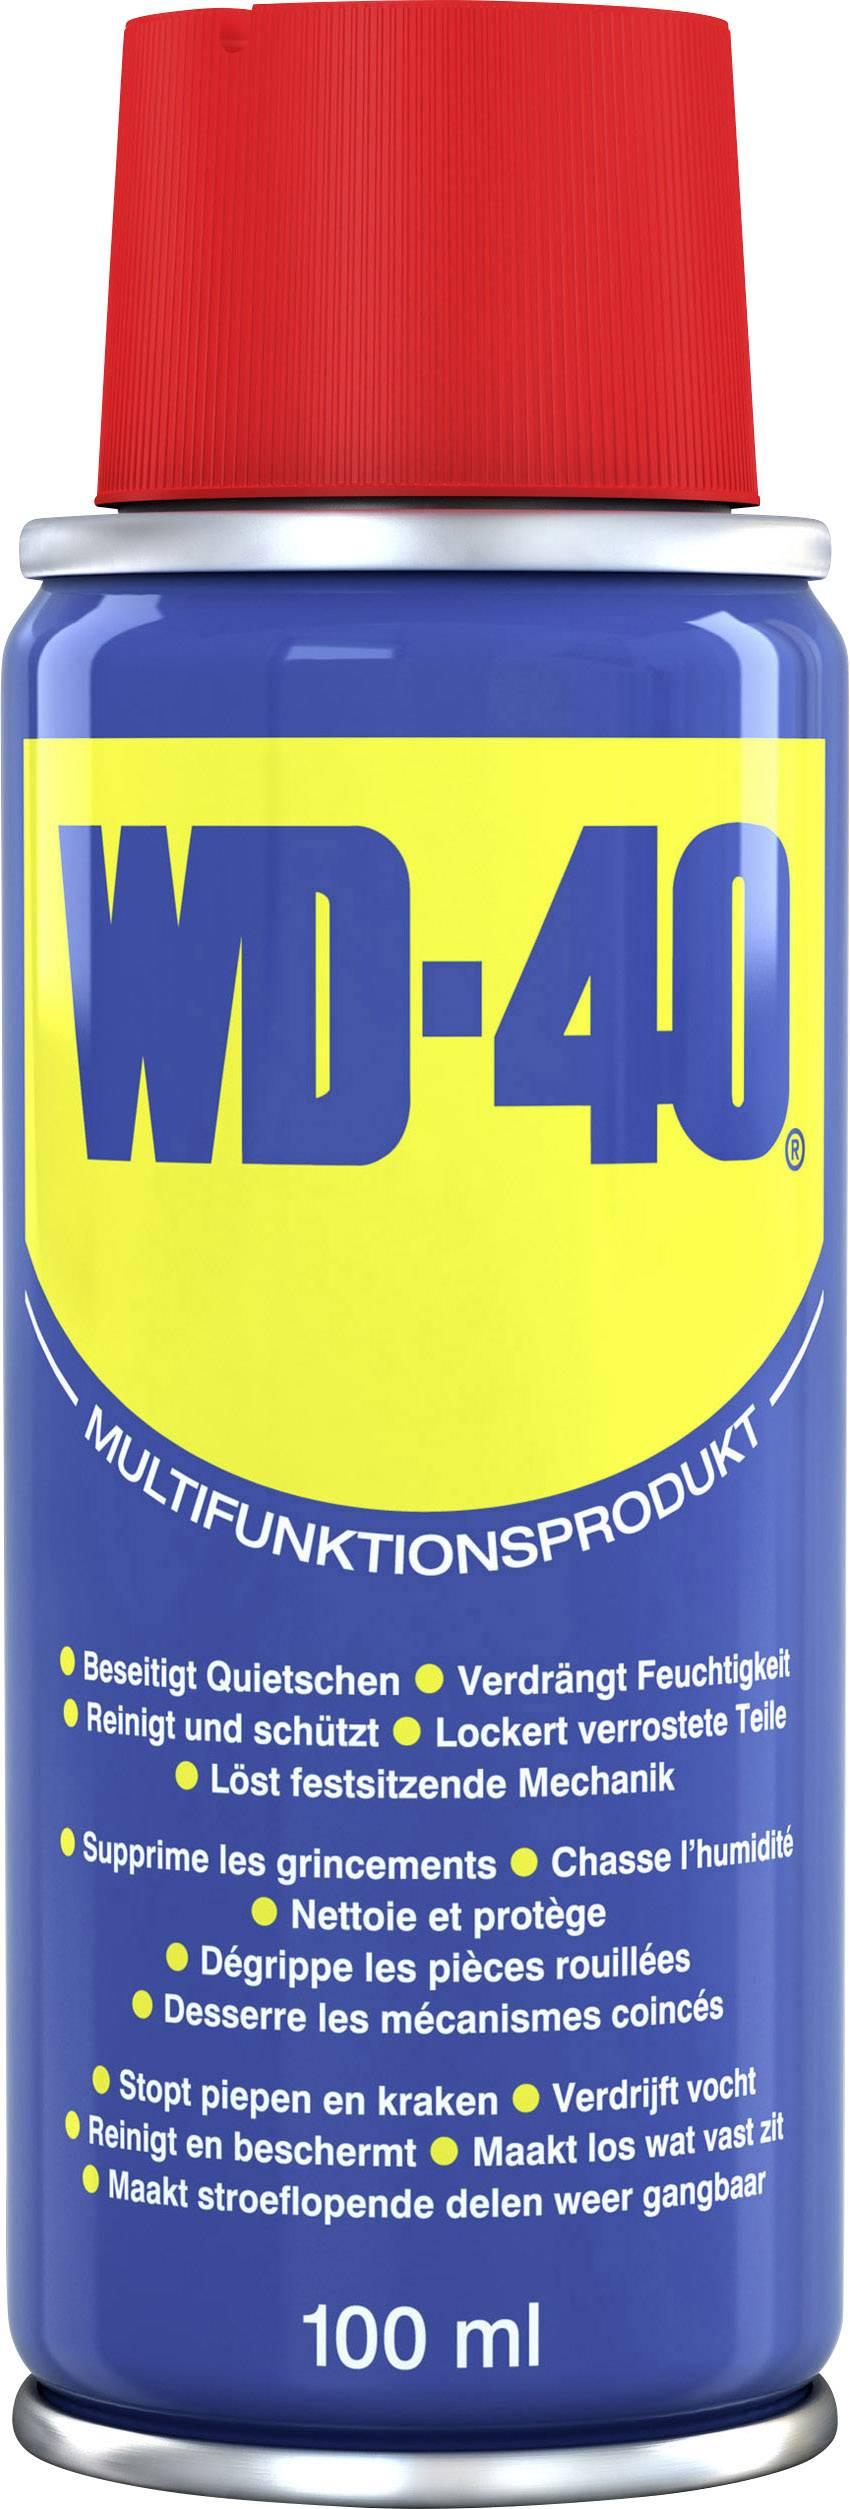 Wundervoll Multi-Öl WD40 Company 49201 100 ml online kaufen » conrad.de WM03